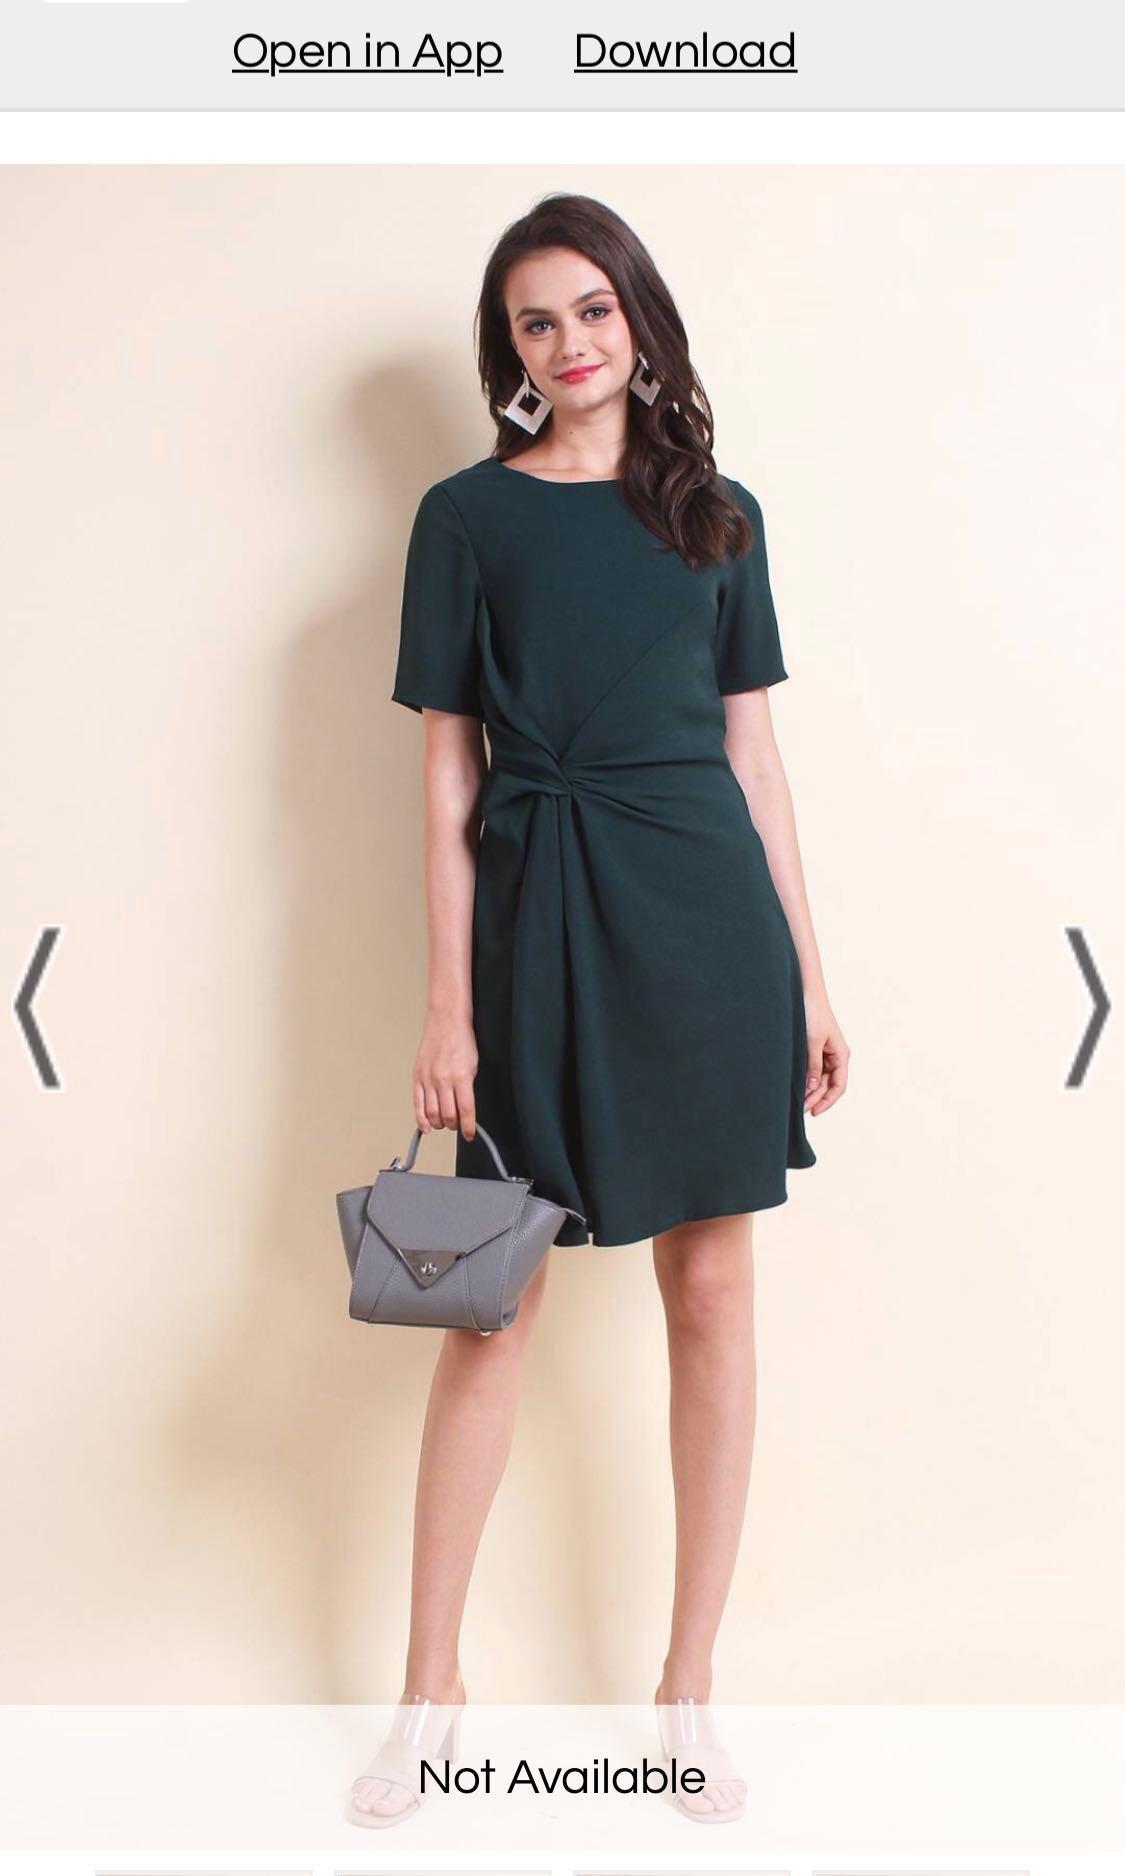 Neonmello Philia Tie Knot A line dress in Forest green